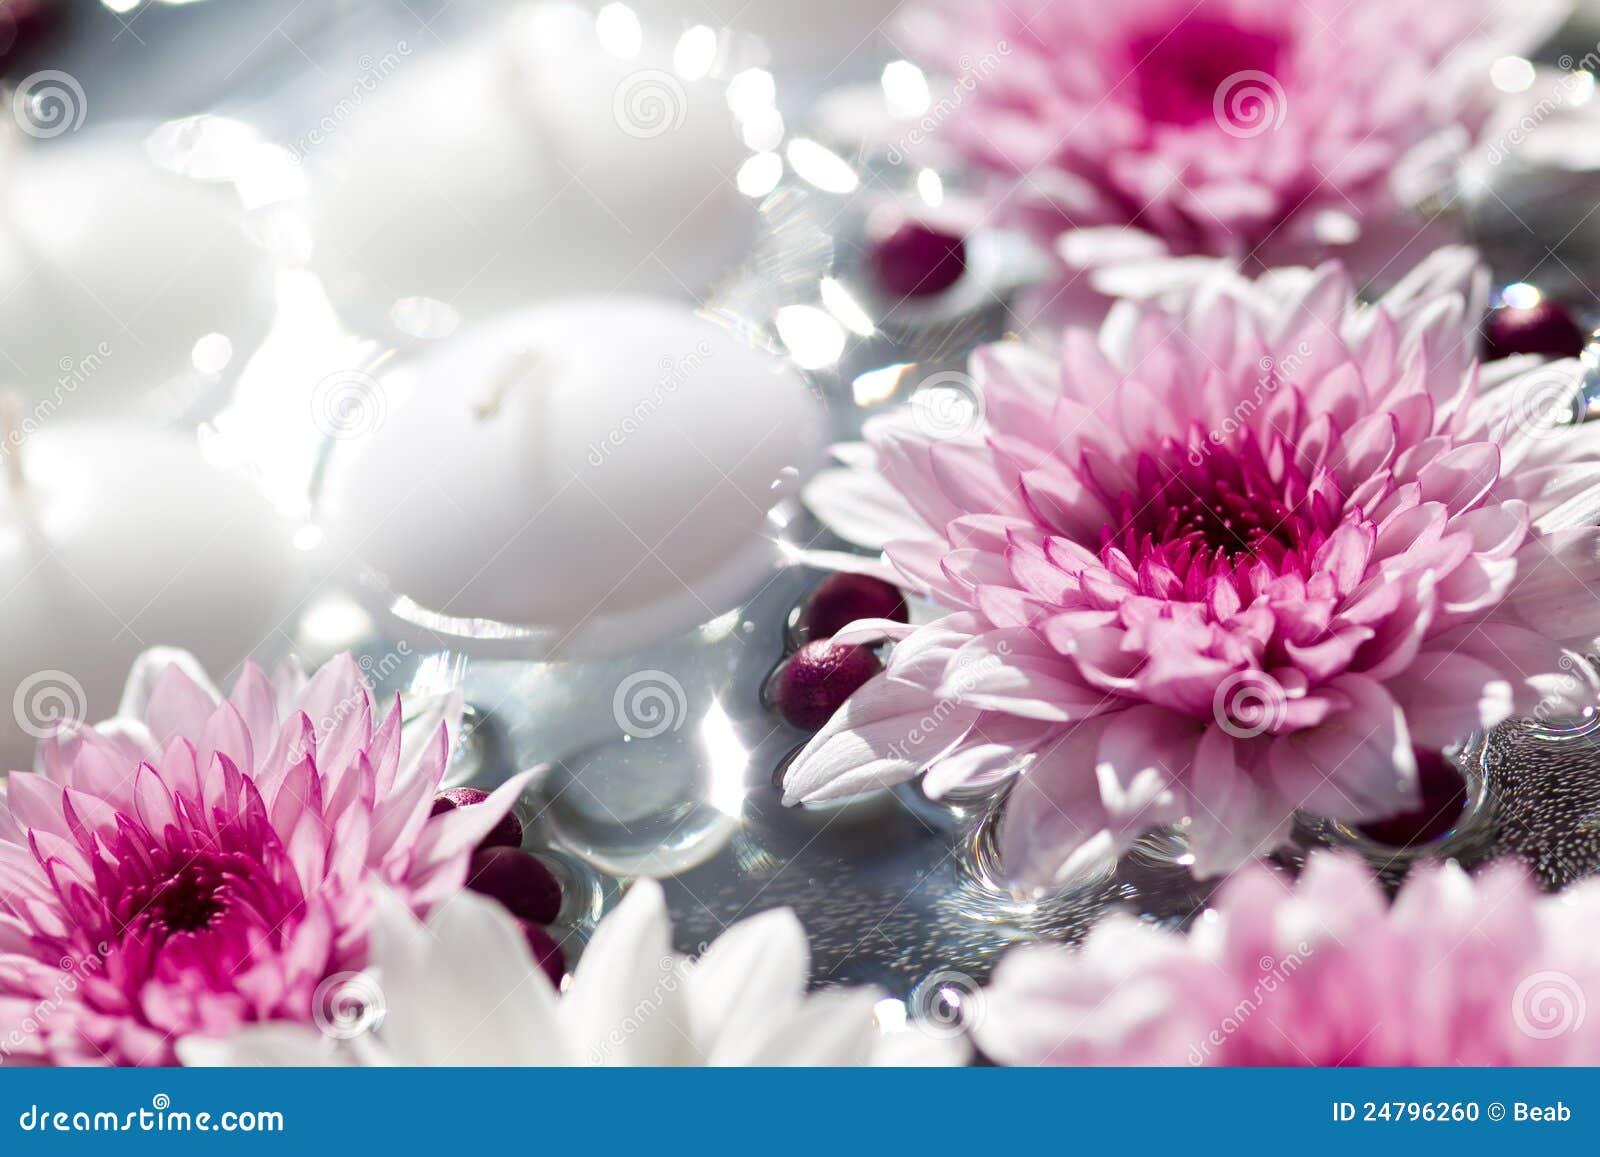 decoration flower - Flower Decorations